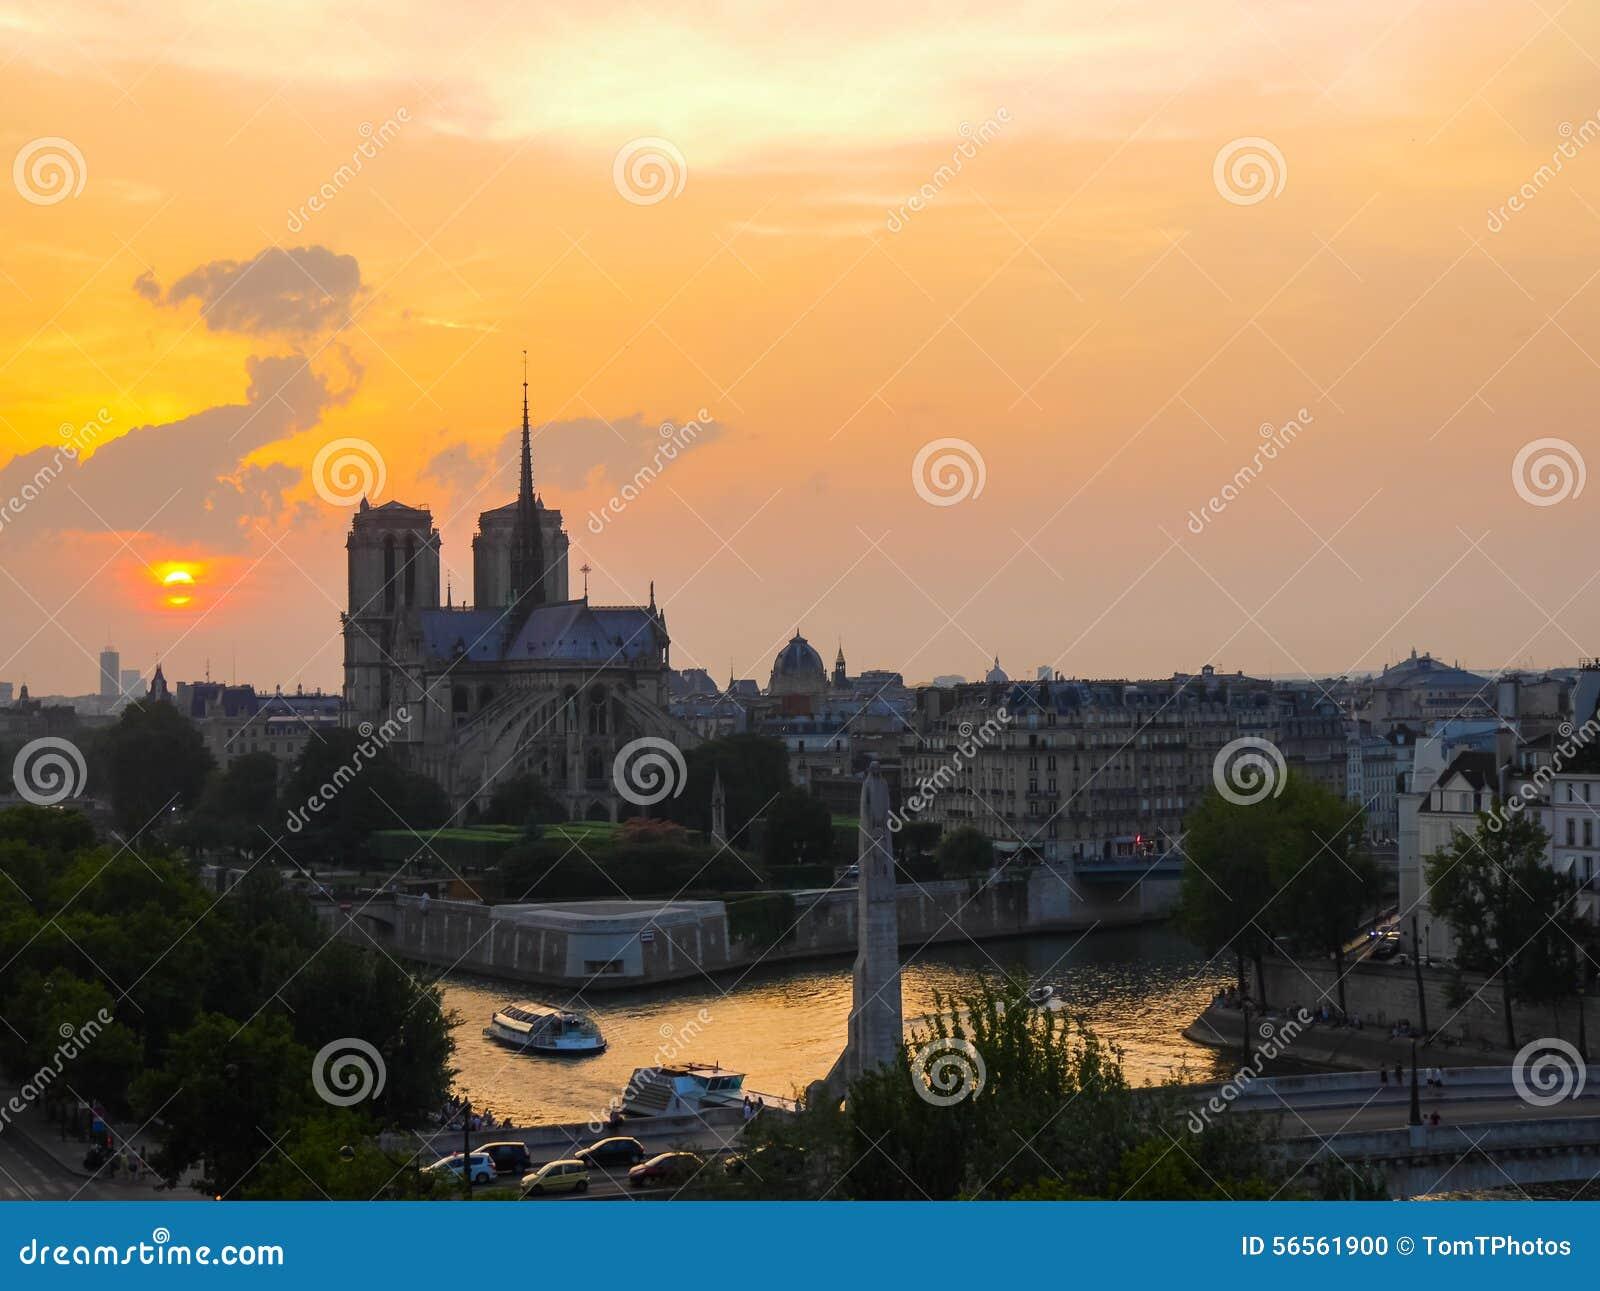 Download Καθεδρικός ναός και ο ποταμός Σηκουάνας της Notre Dame στο Παρίσι στο ηλιοβασίλεμα Στοκ Εικόνες - εικόνα από γαλλία, από: 56561900